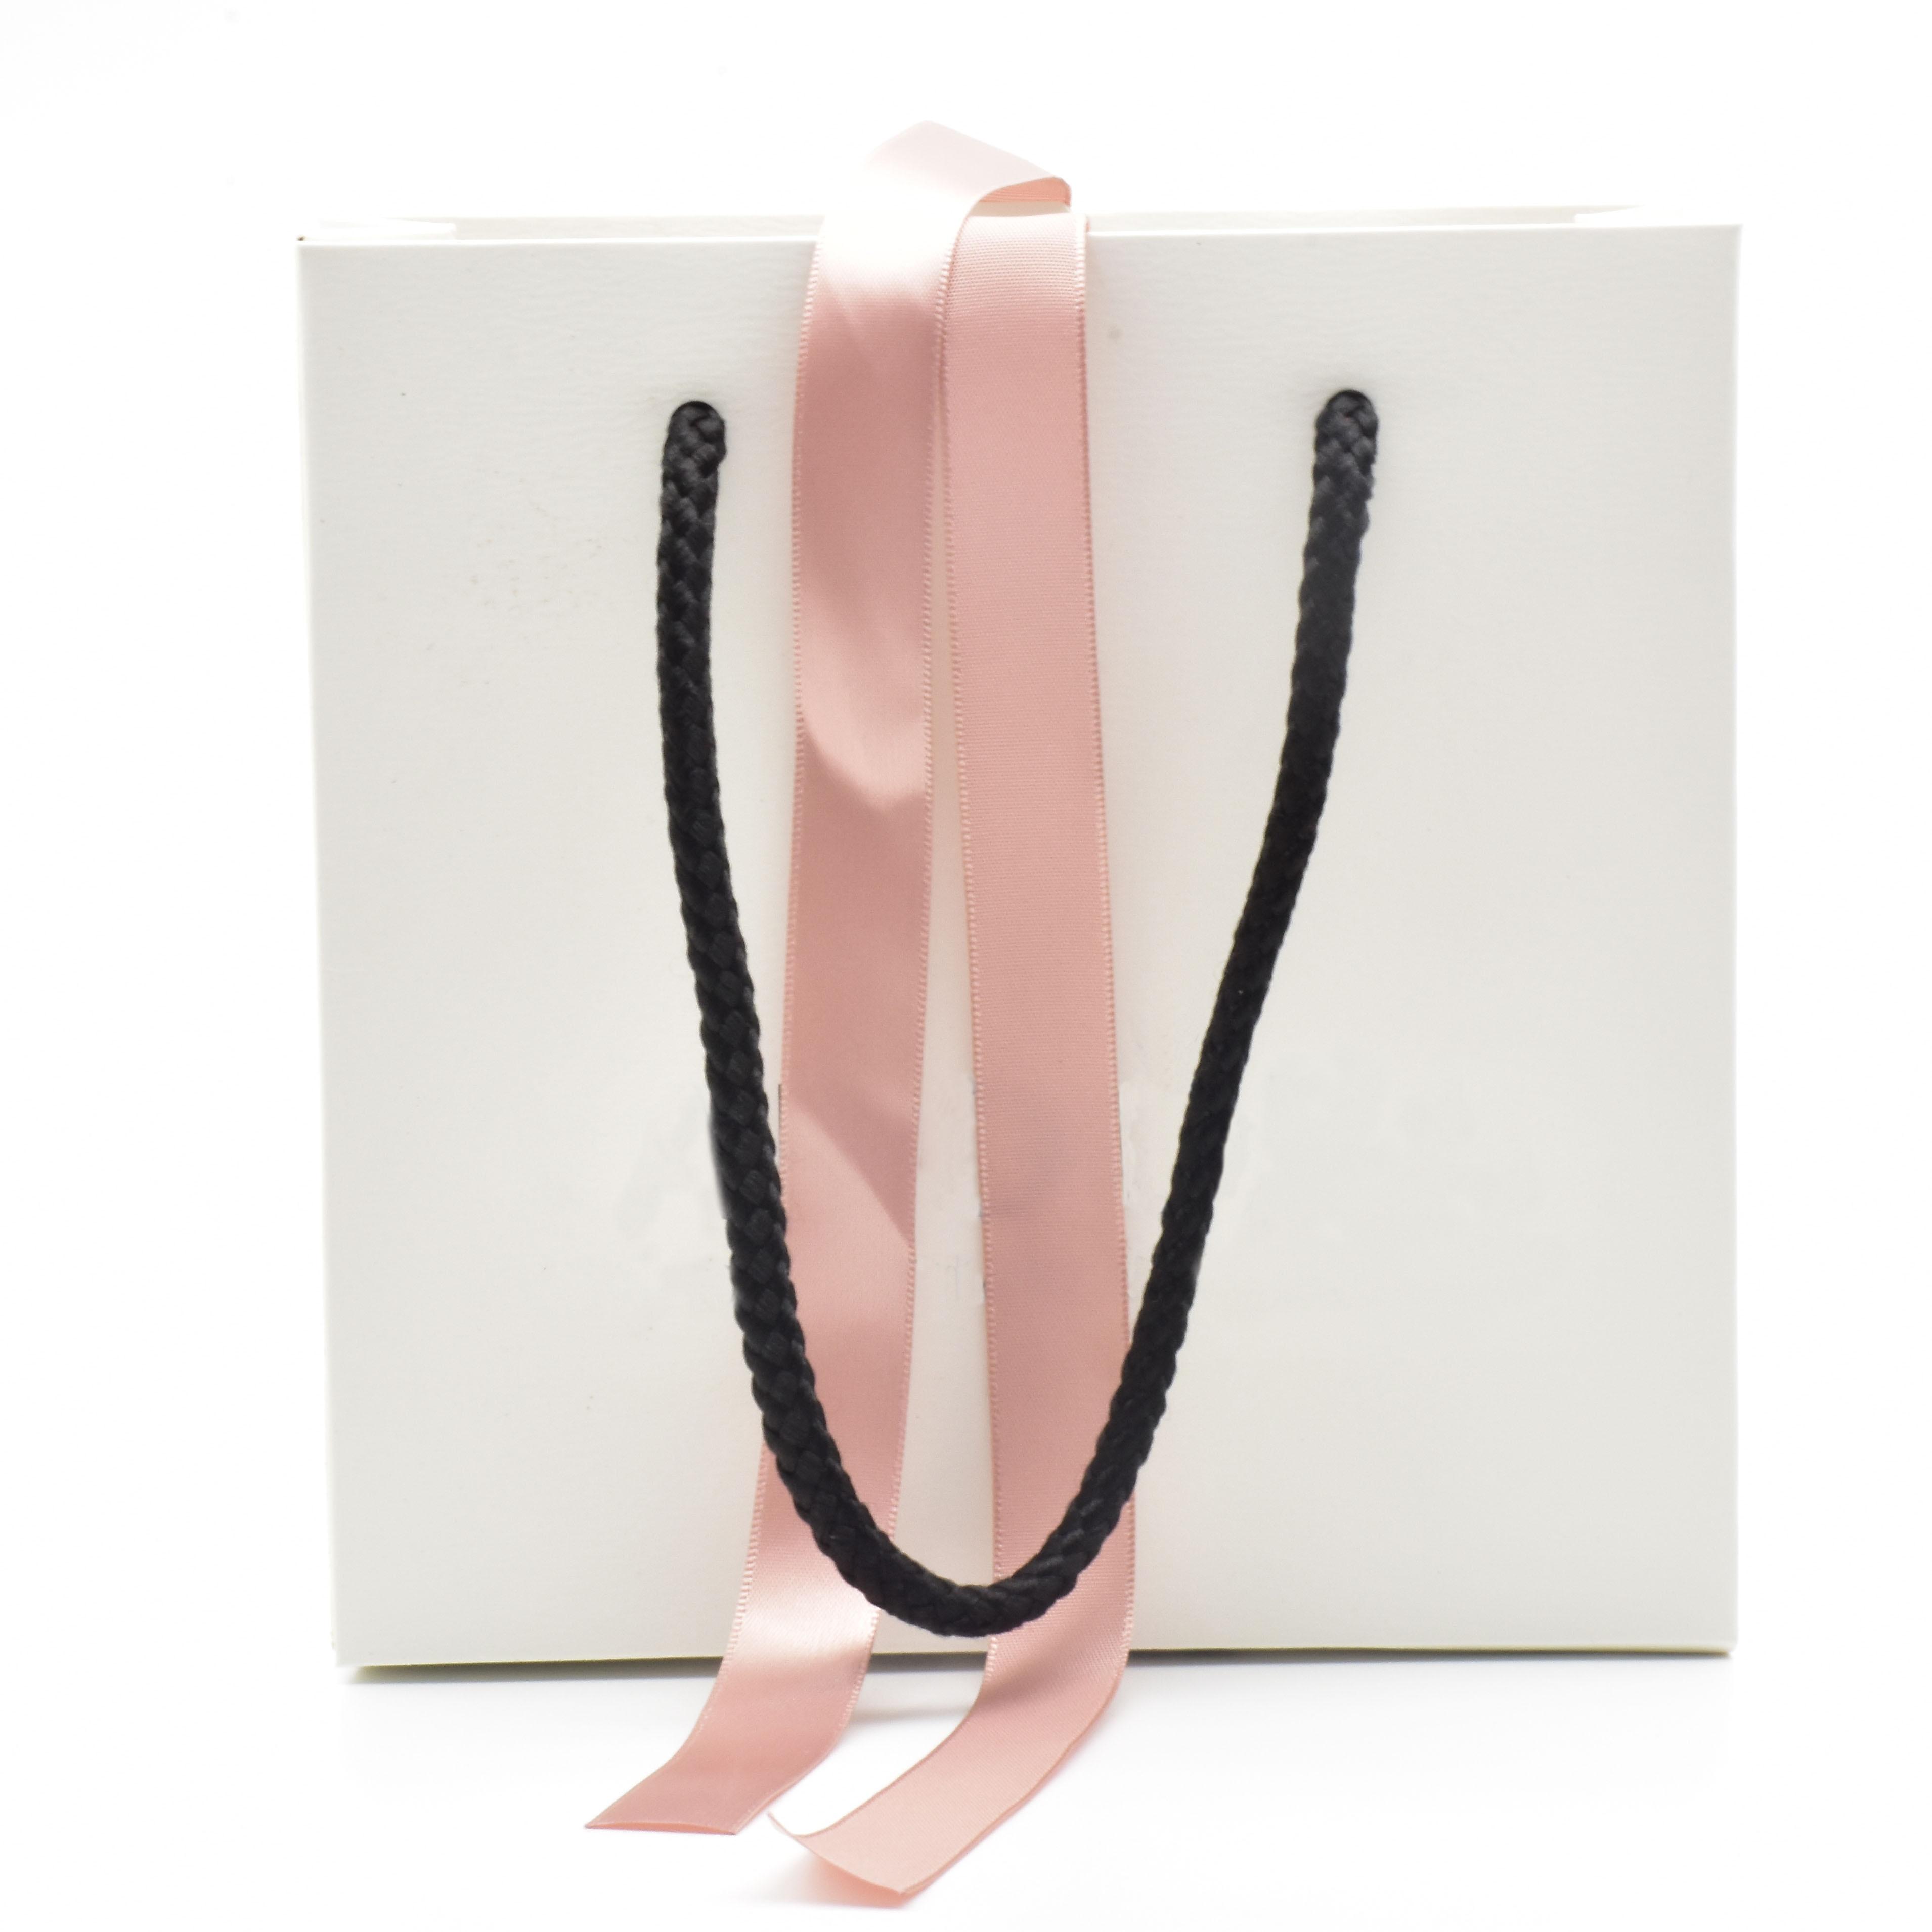 Wholesale 50Pcs Exquisite High-Quality Classic Paper Gift Bag Fit Original Pan Jewelry Box Packaging Bag Shop 16*16*6cm